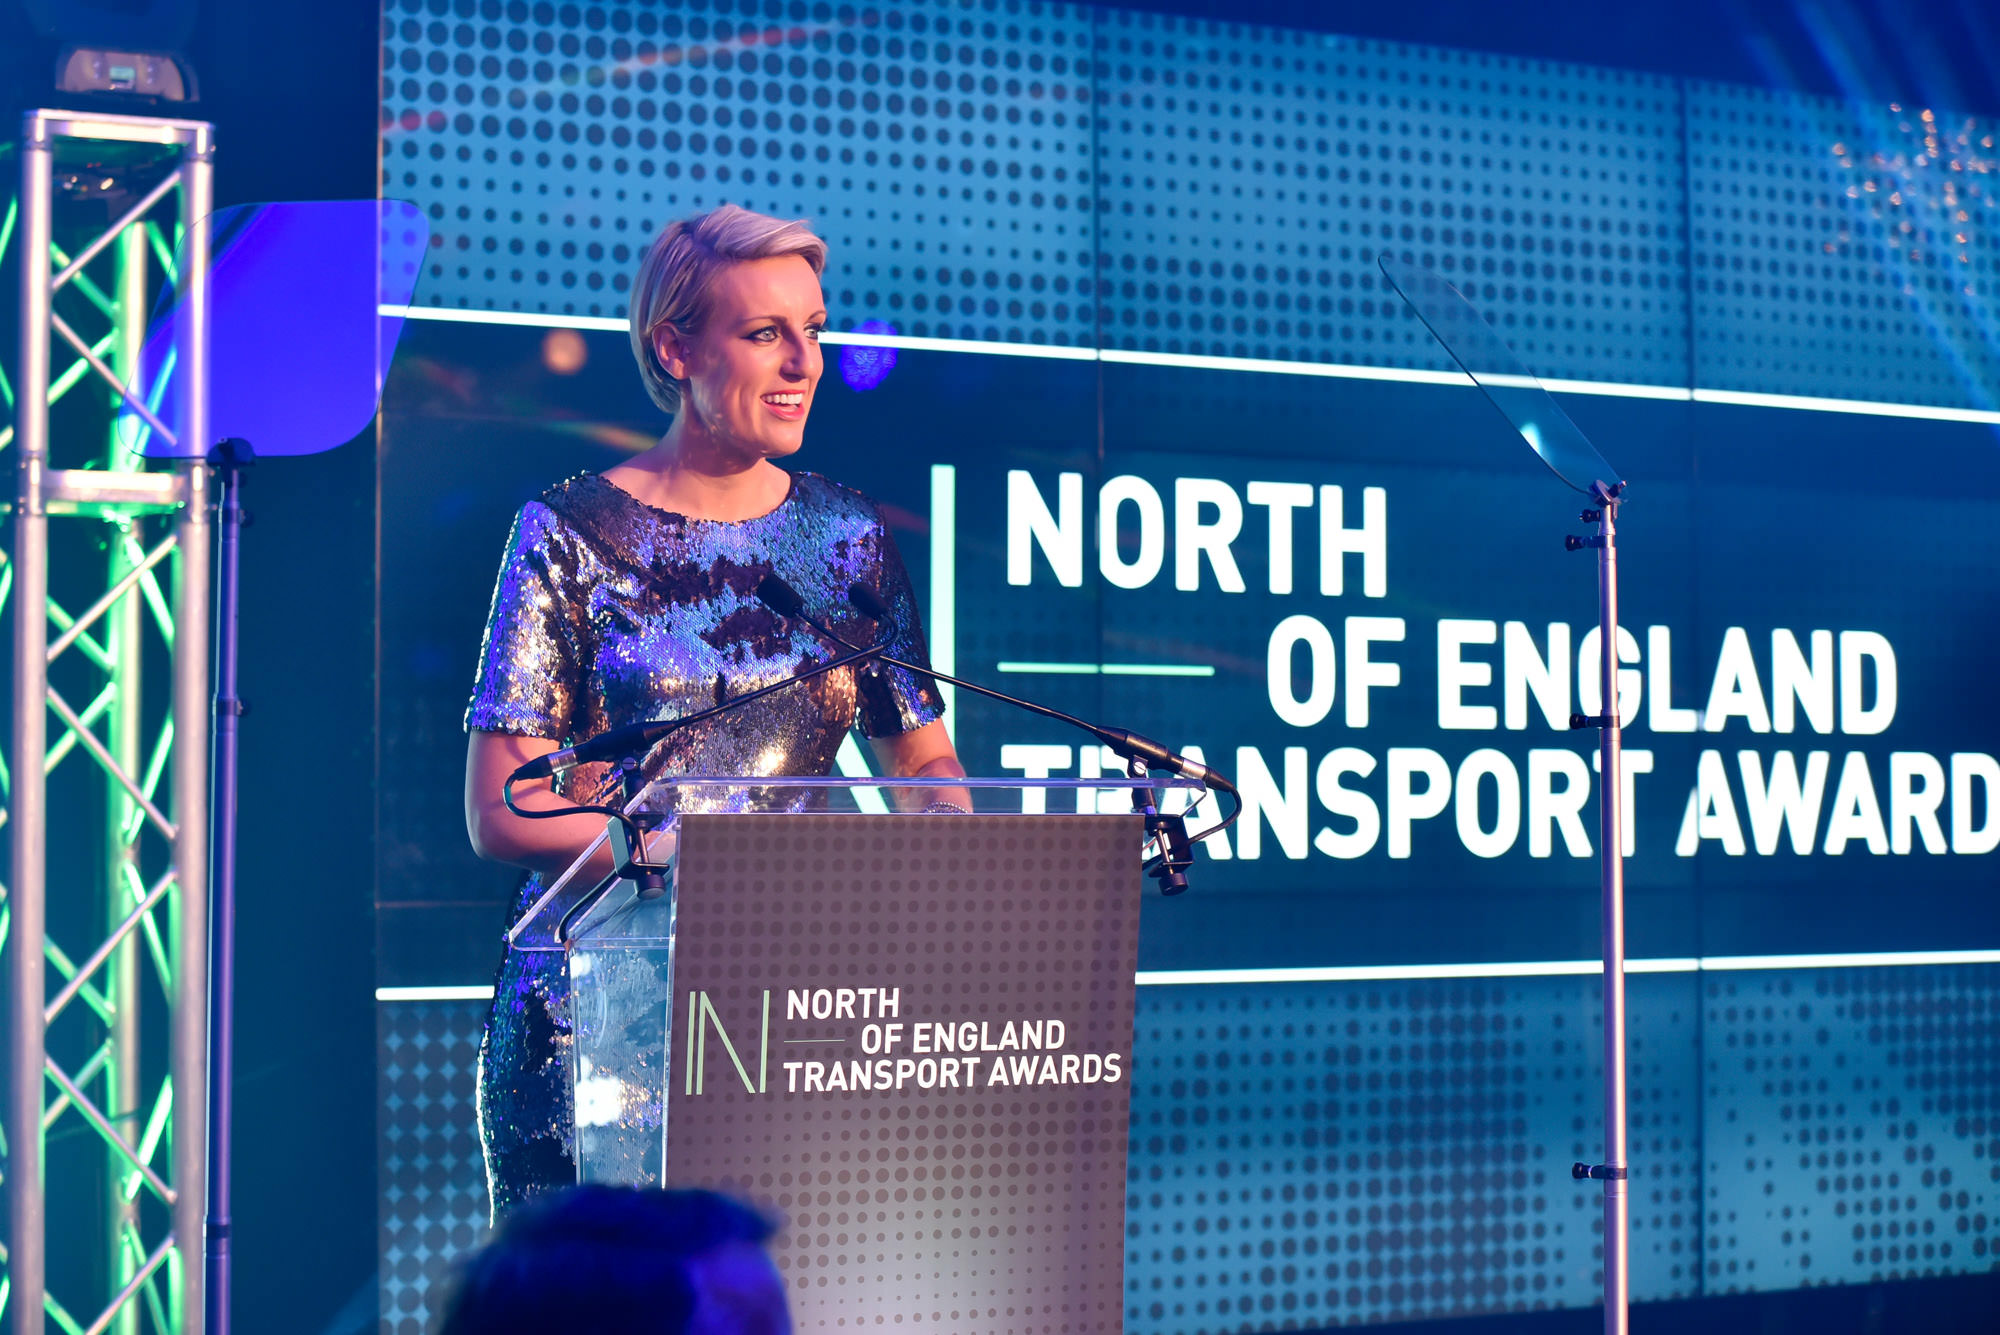 NorthOfEngland_TransportAwards_120.jpg